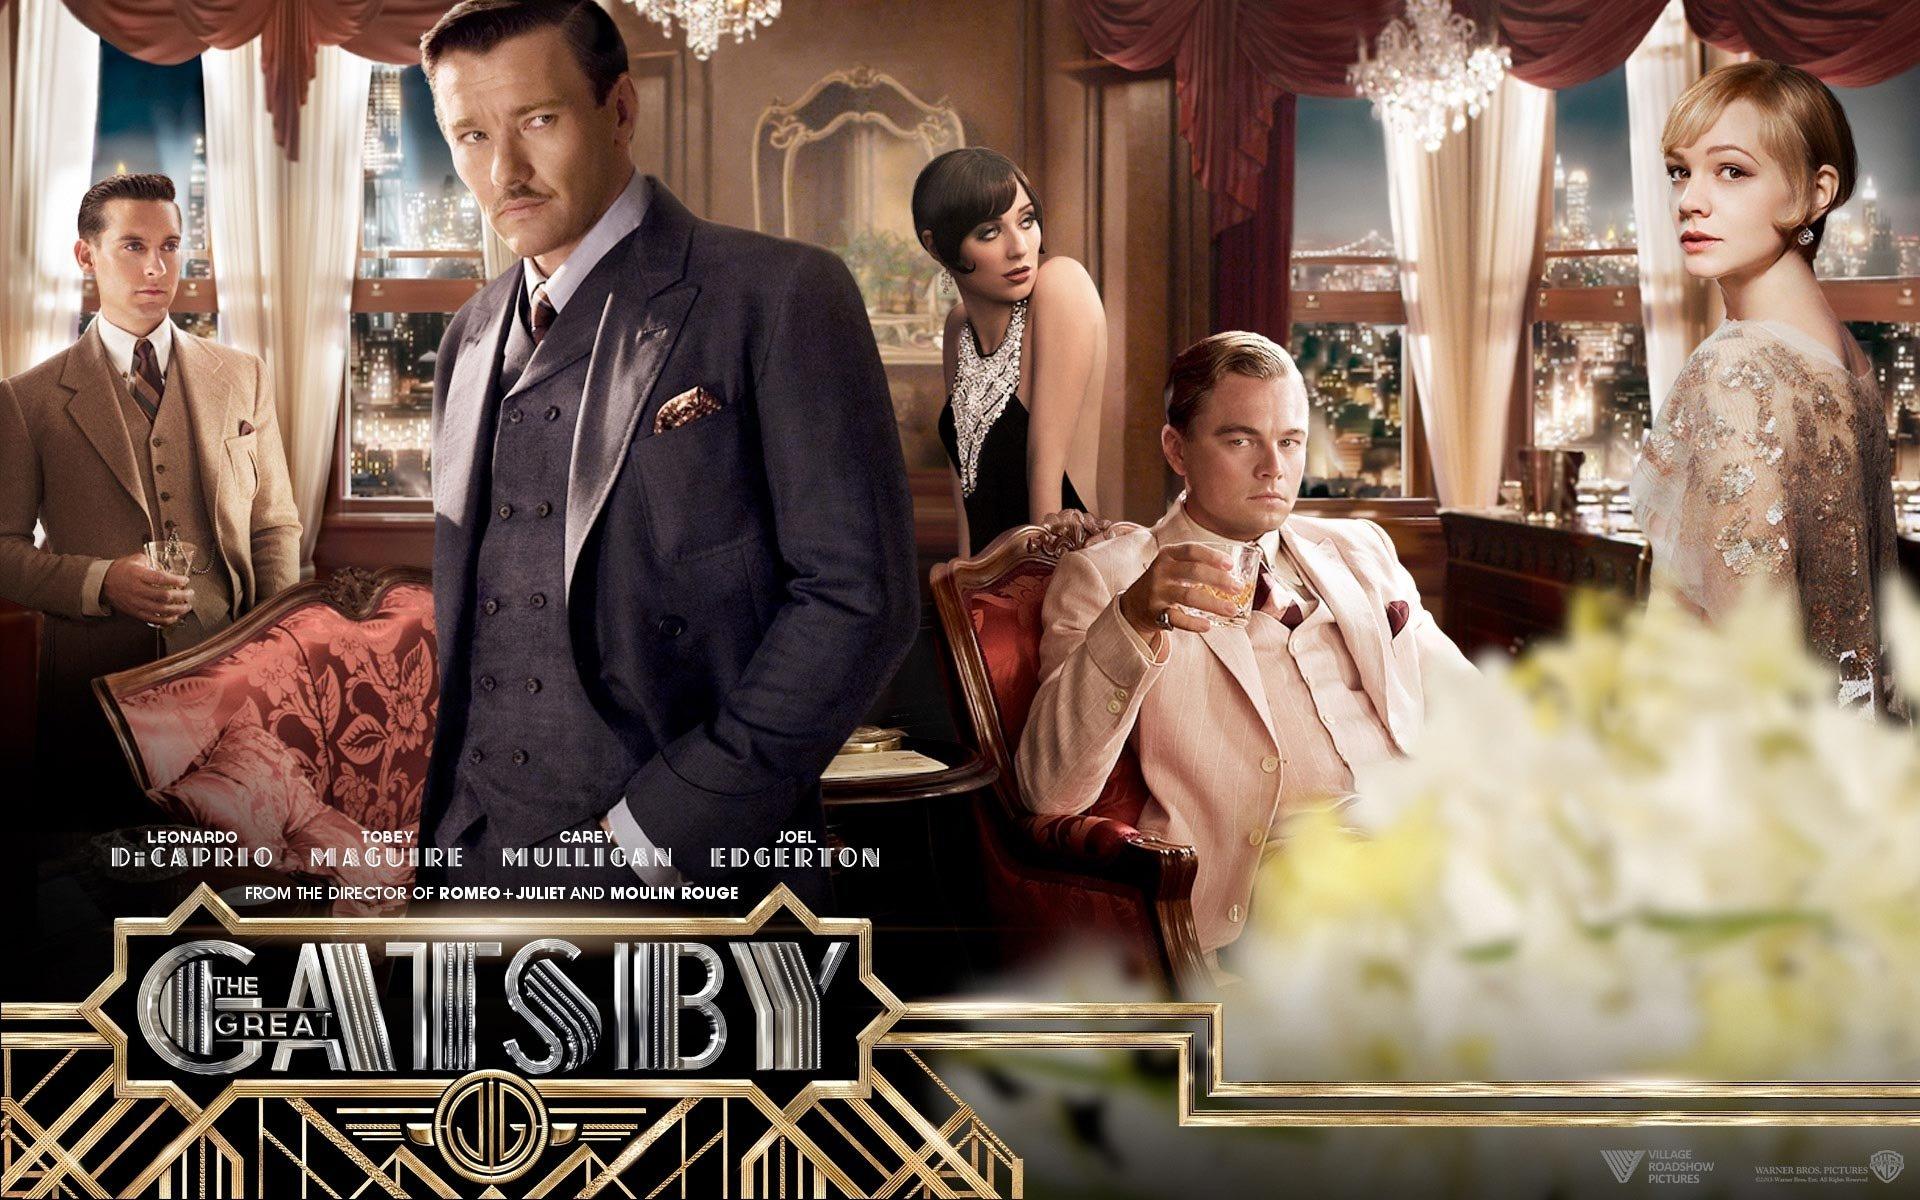 Movie - The Great Gatsby  Leonardo Dicaprio Tobey Maguire Carey Mulligan Elizabeth Debicki Joel Edgerton Wallpaper